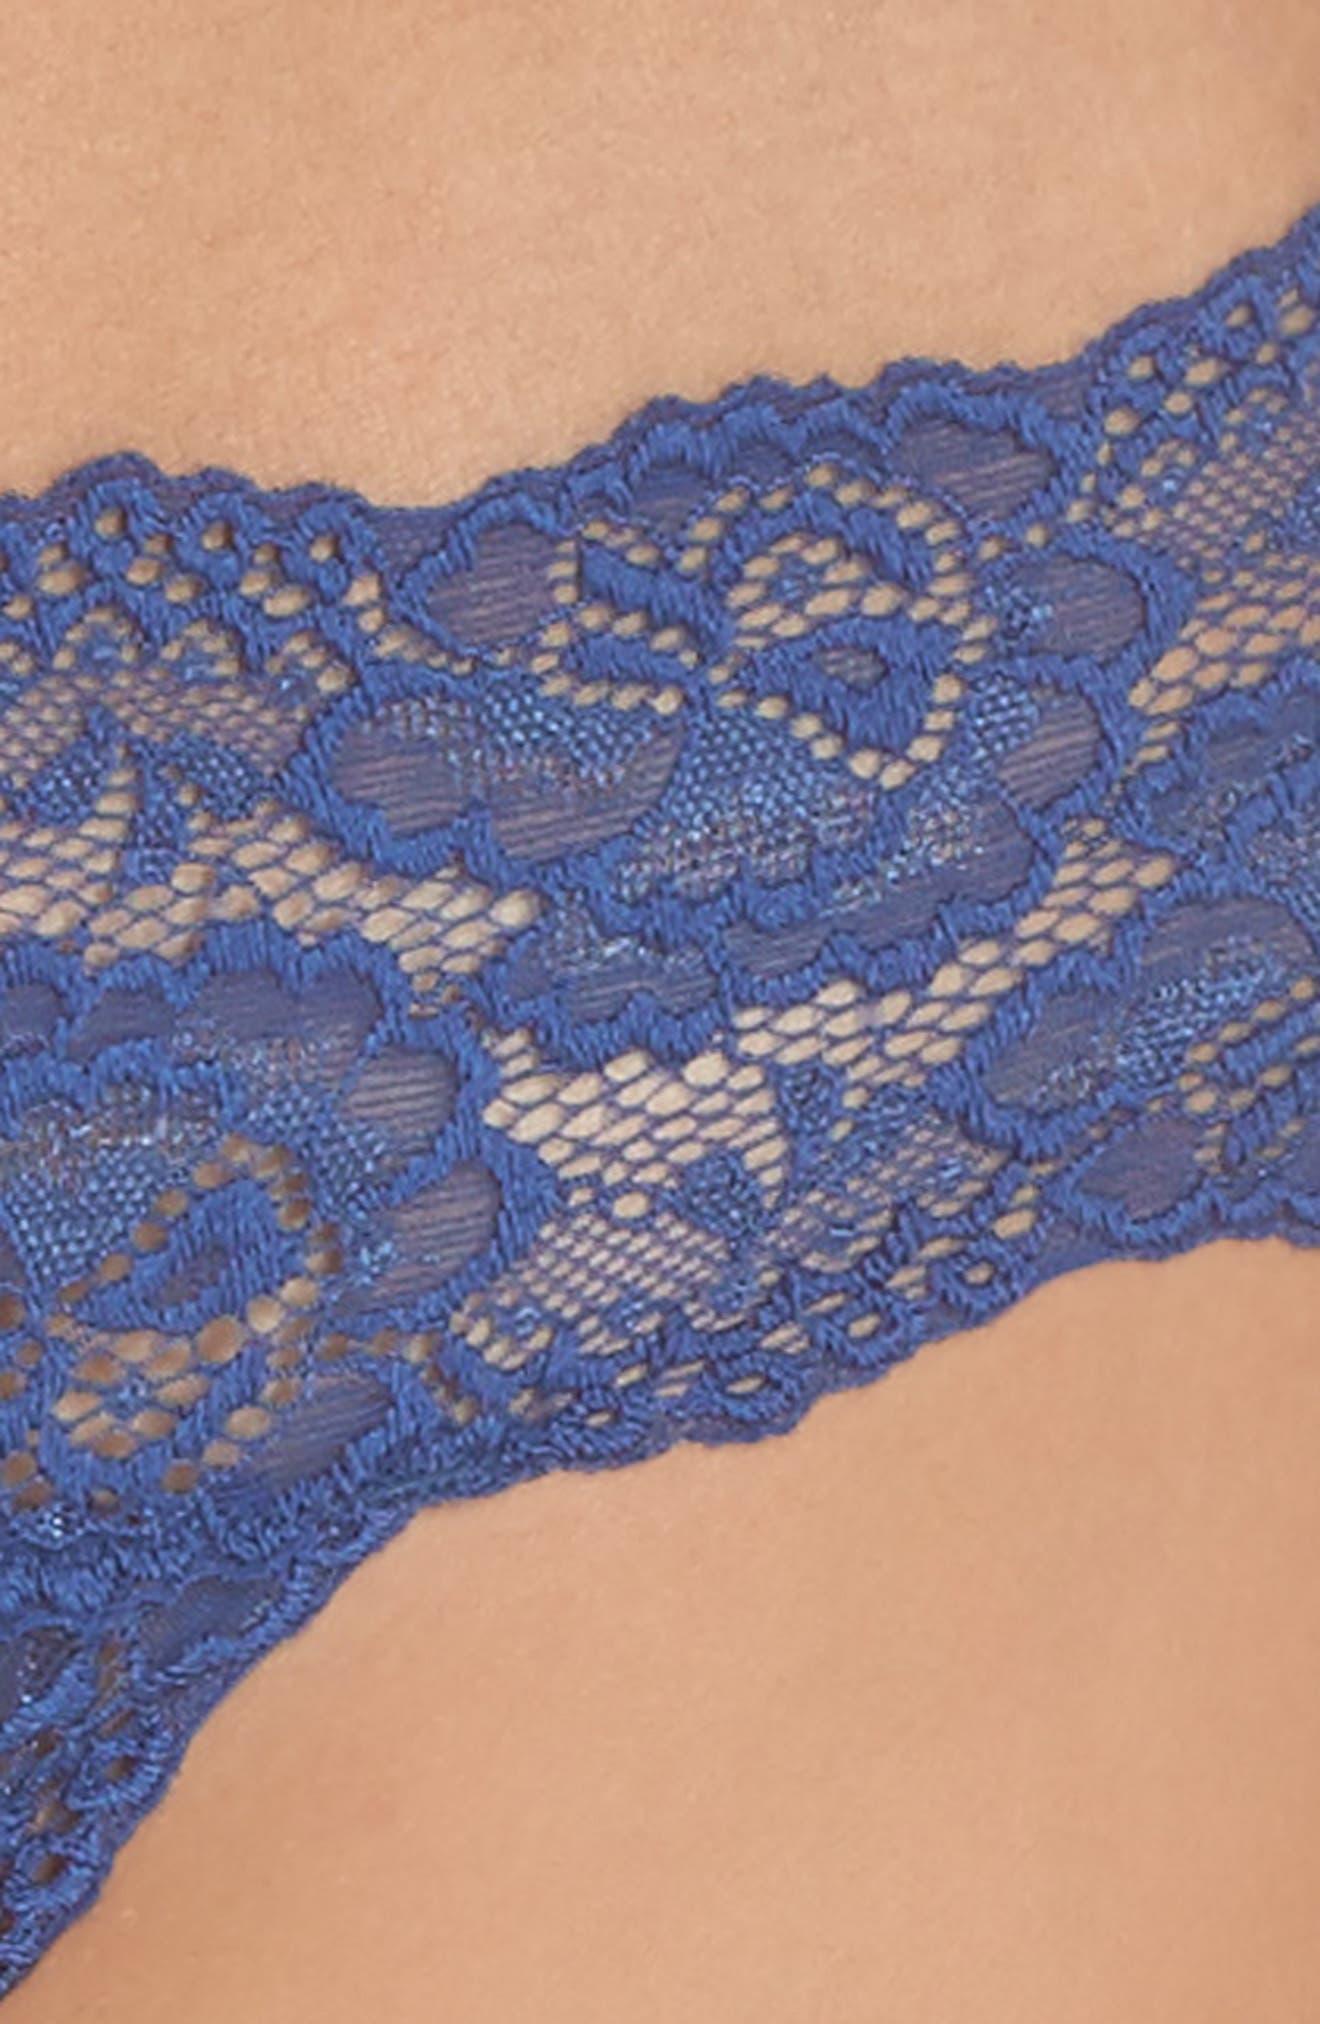 'Goddess' Cheeky Hipster Bikini,                             Alternate thumbnail 183, color,